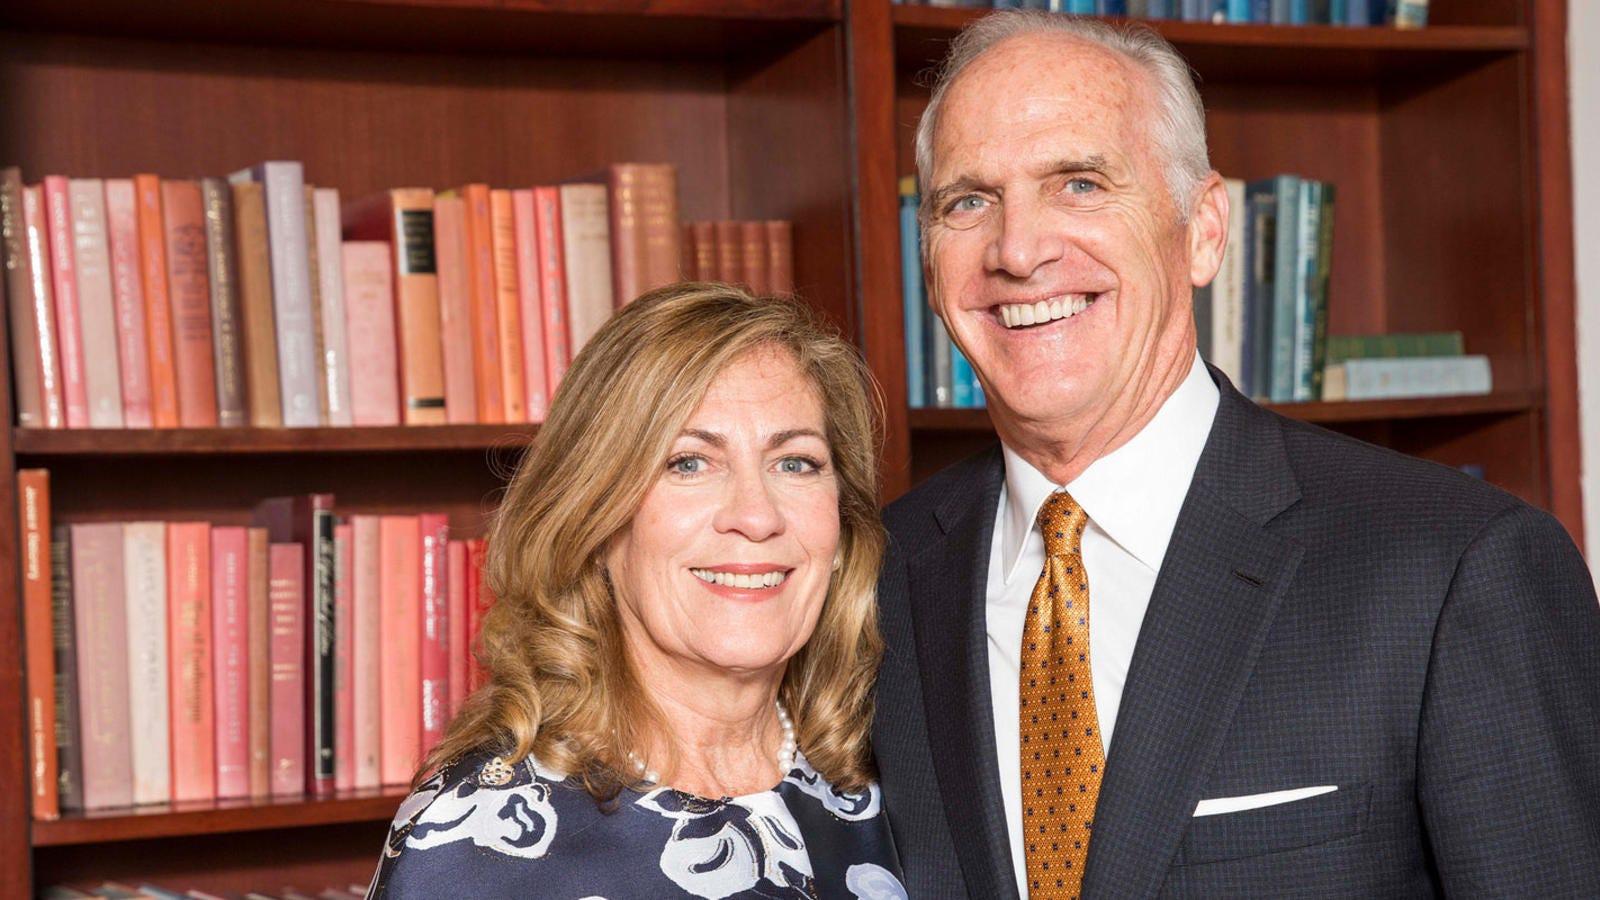 Saint Joe's alum, a former health care CEO, gives back